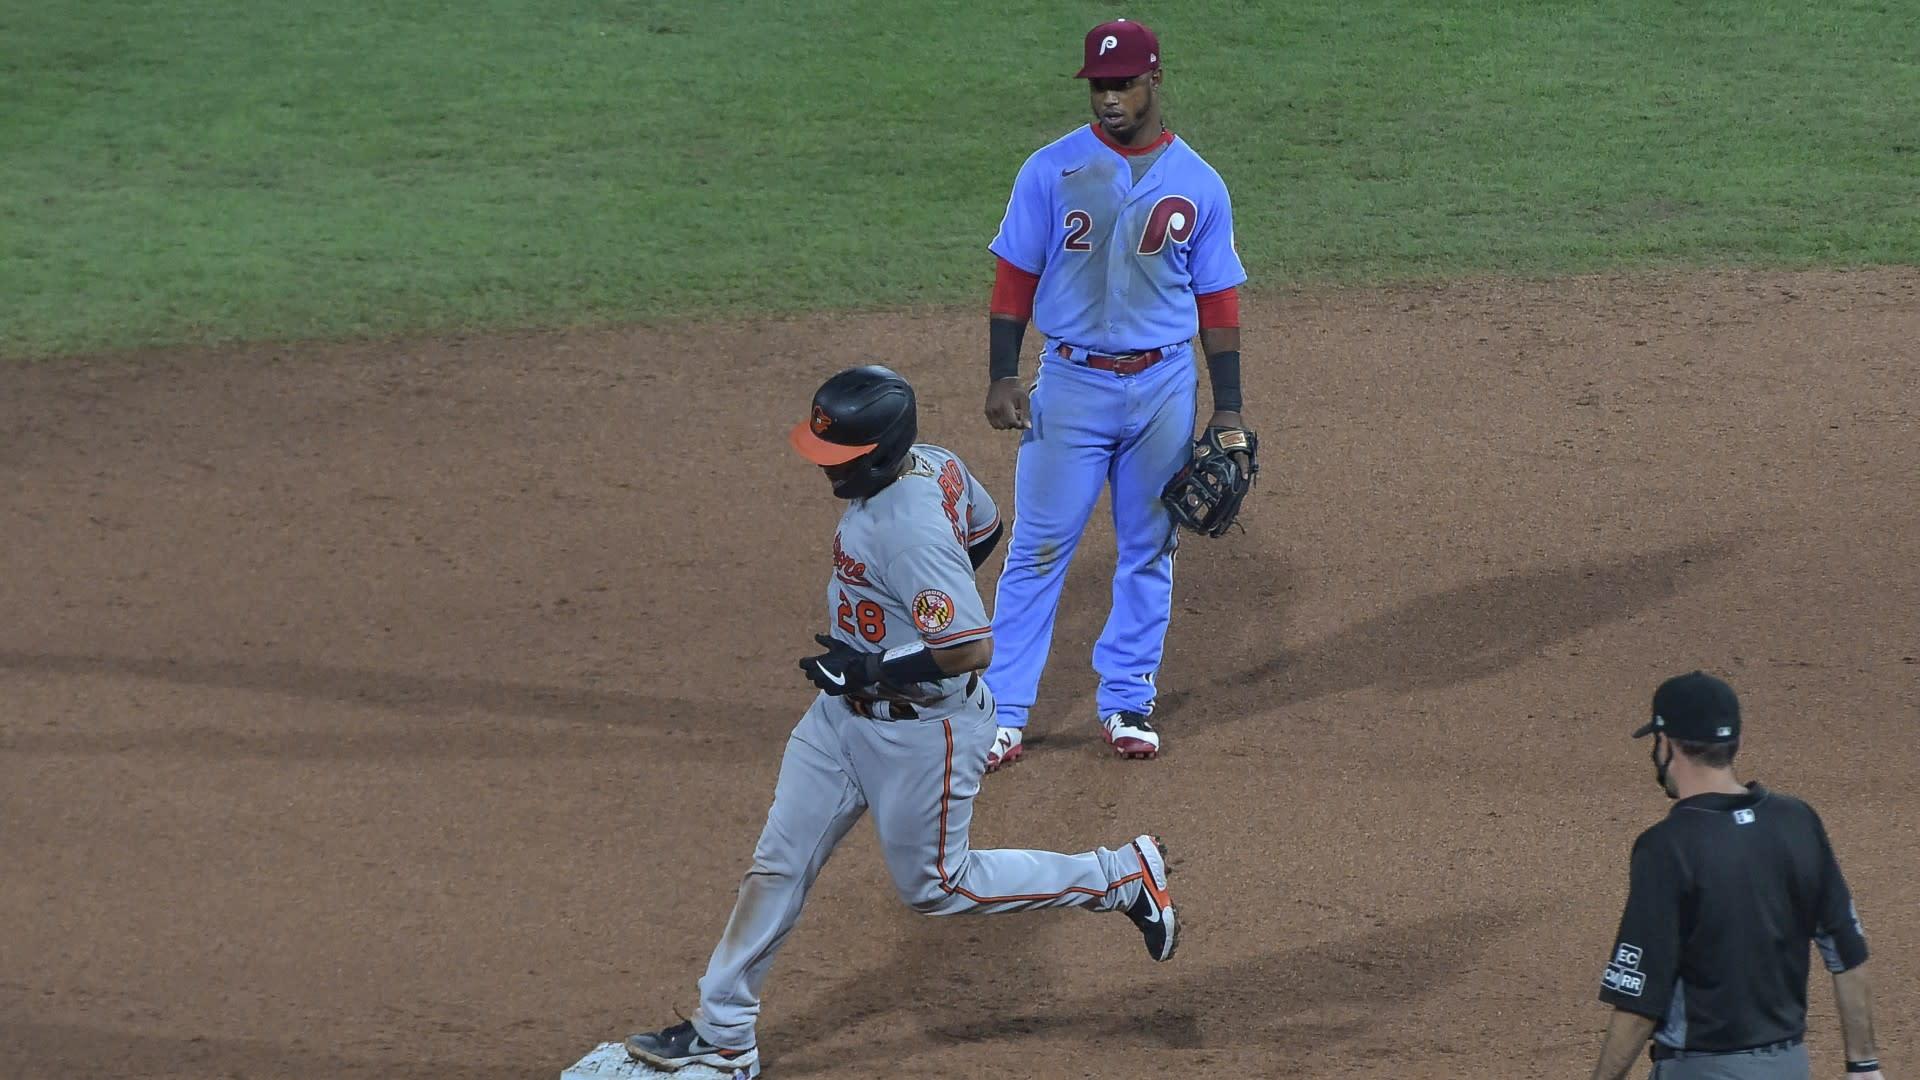 Phillies analyst calls team 'lifeless' following Orioles series sweep